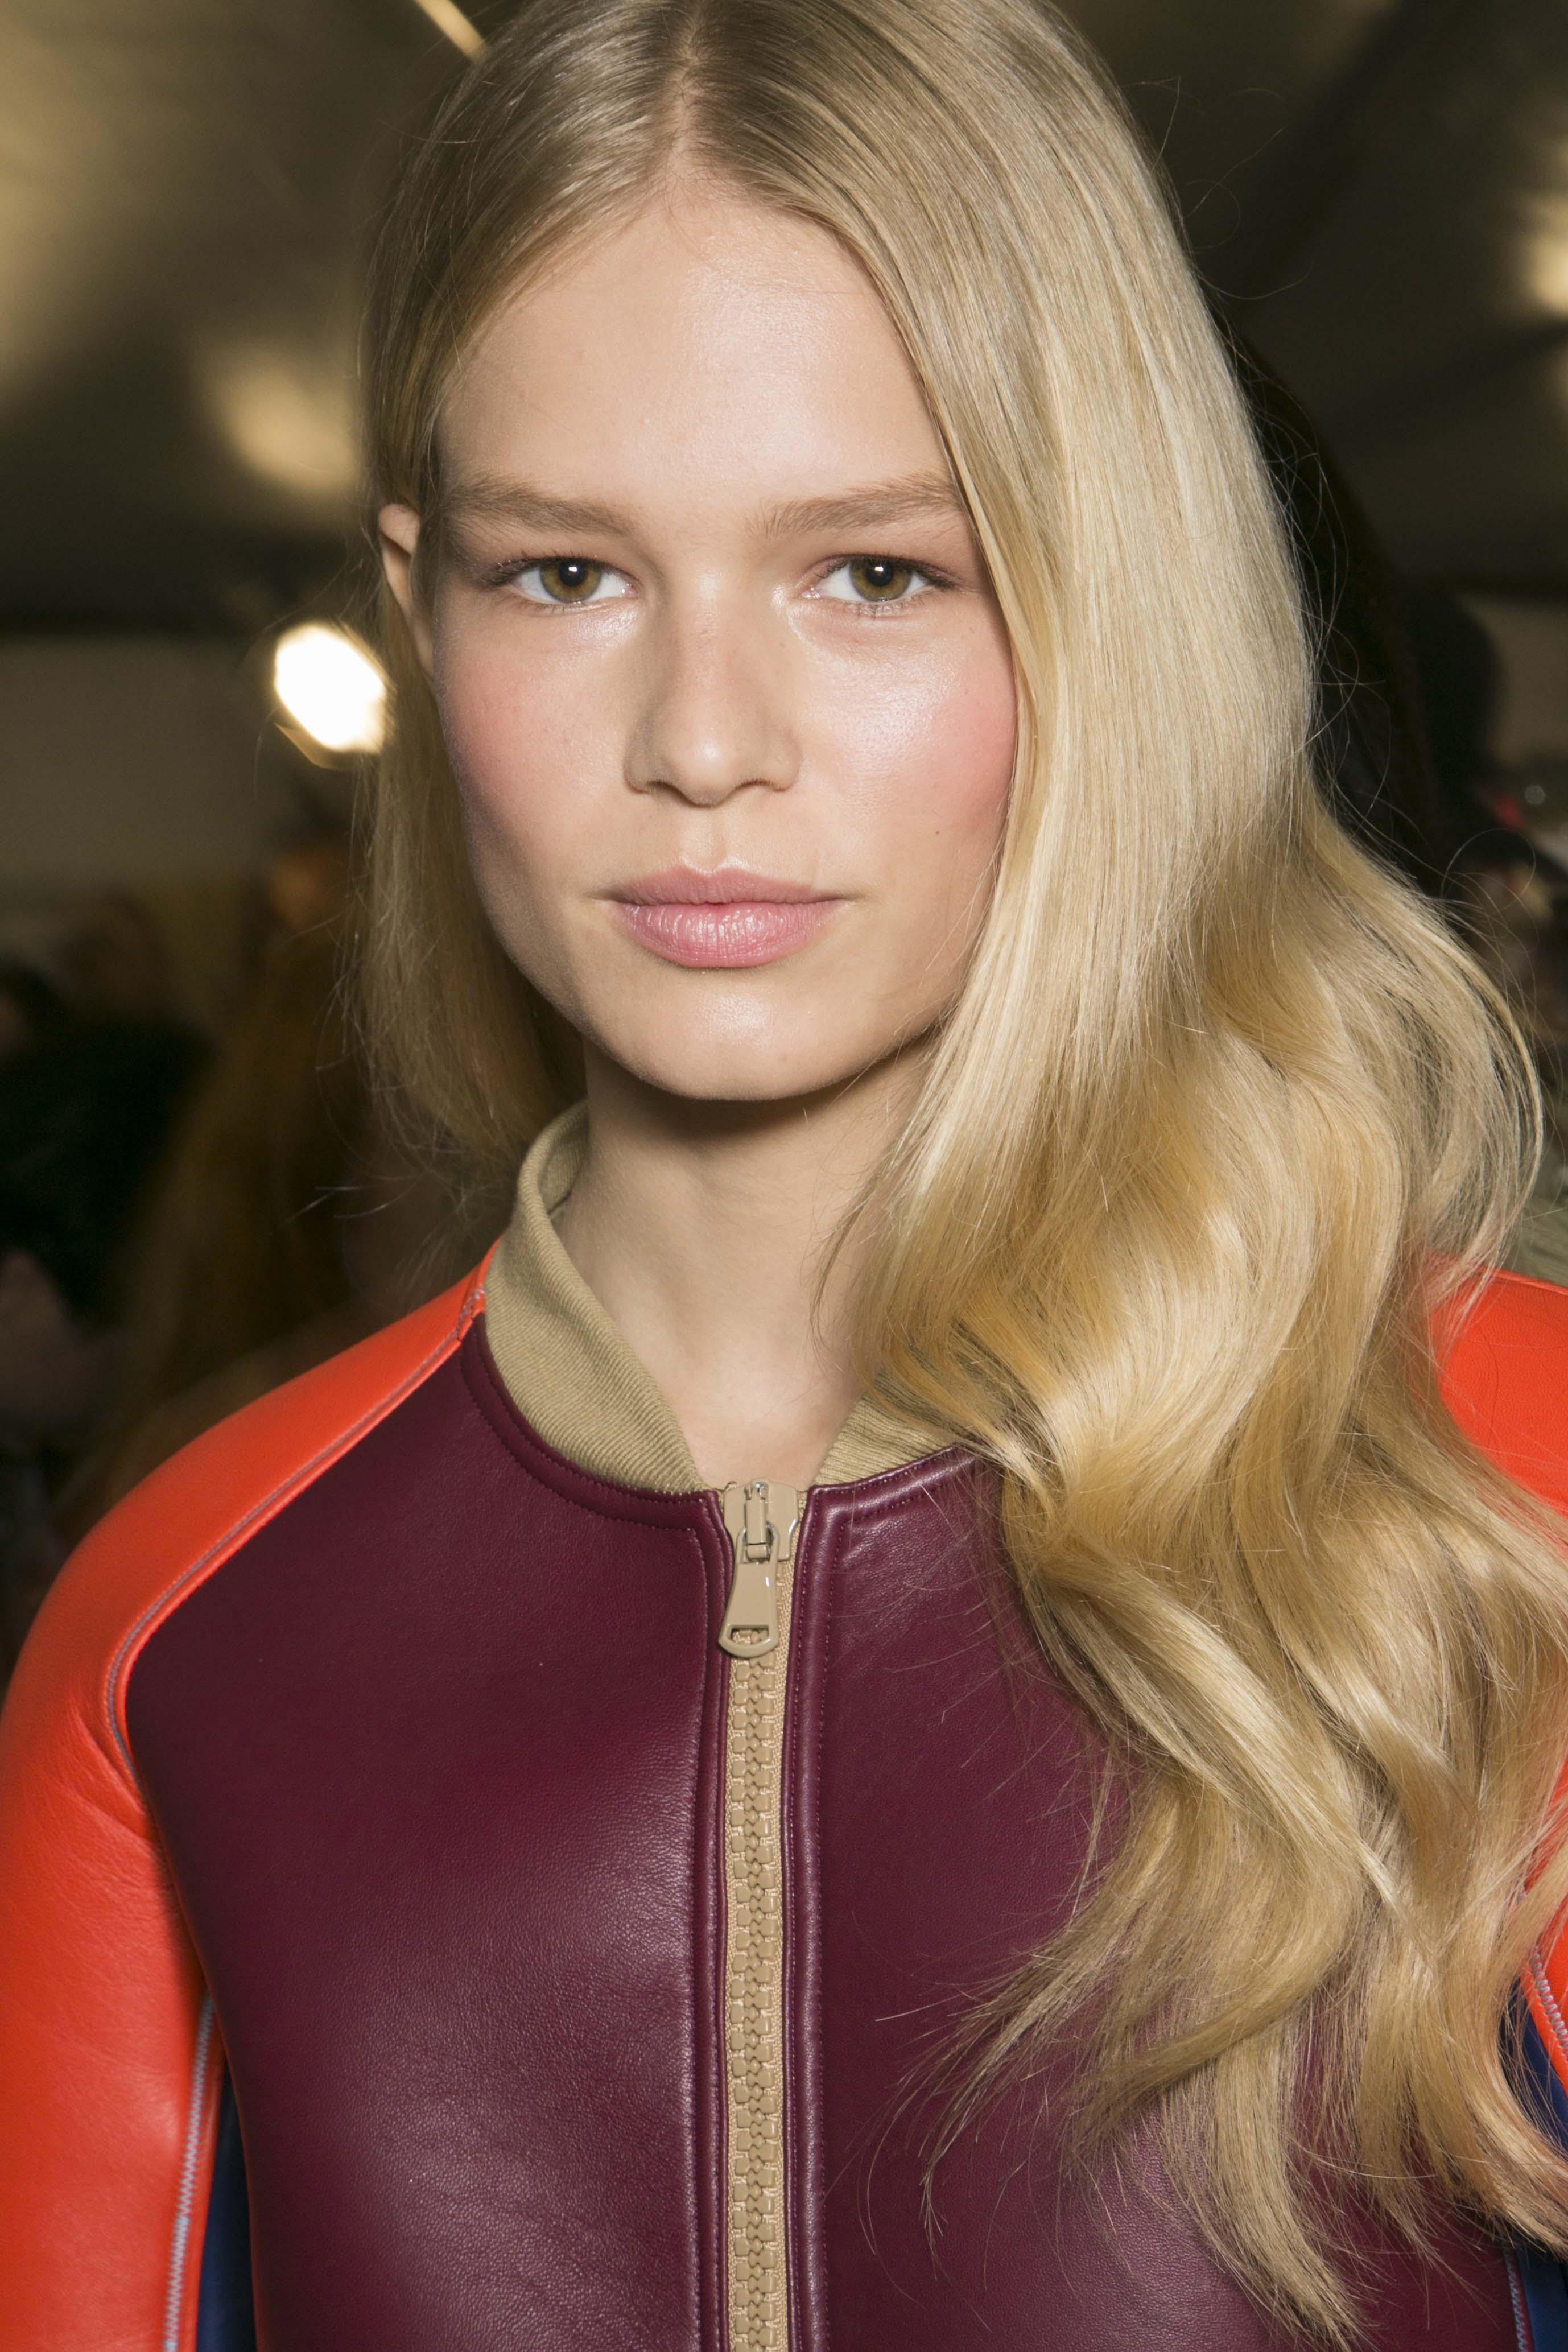 hair gloss treatments wavy blonde hair